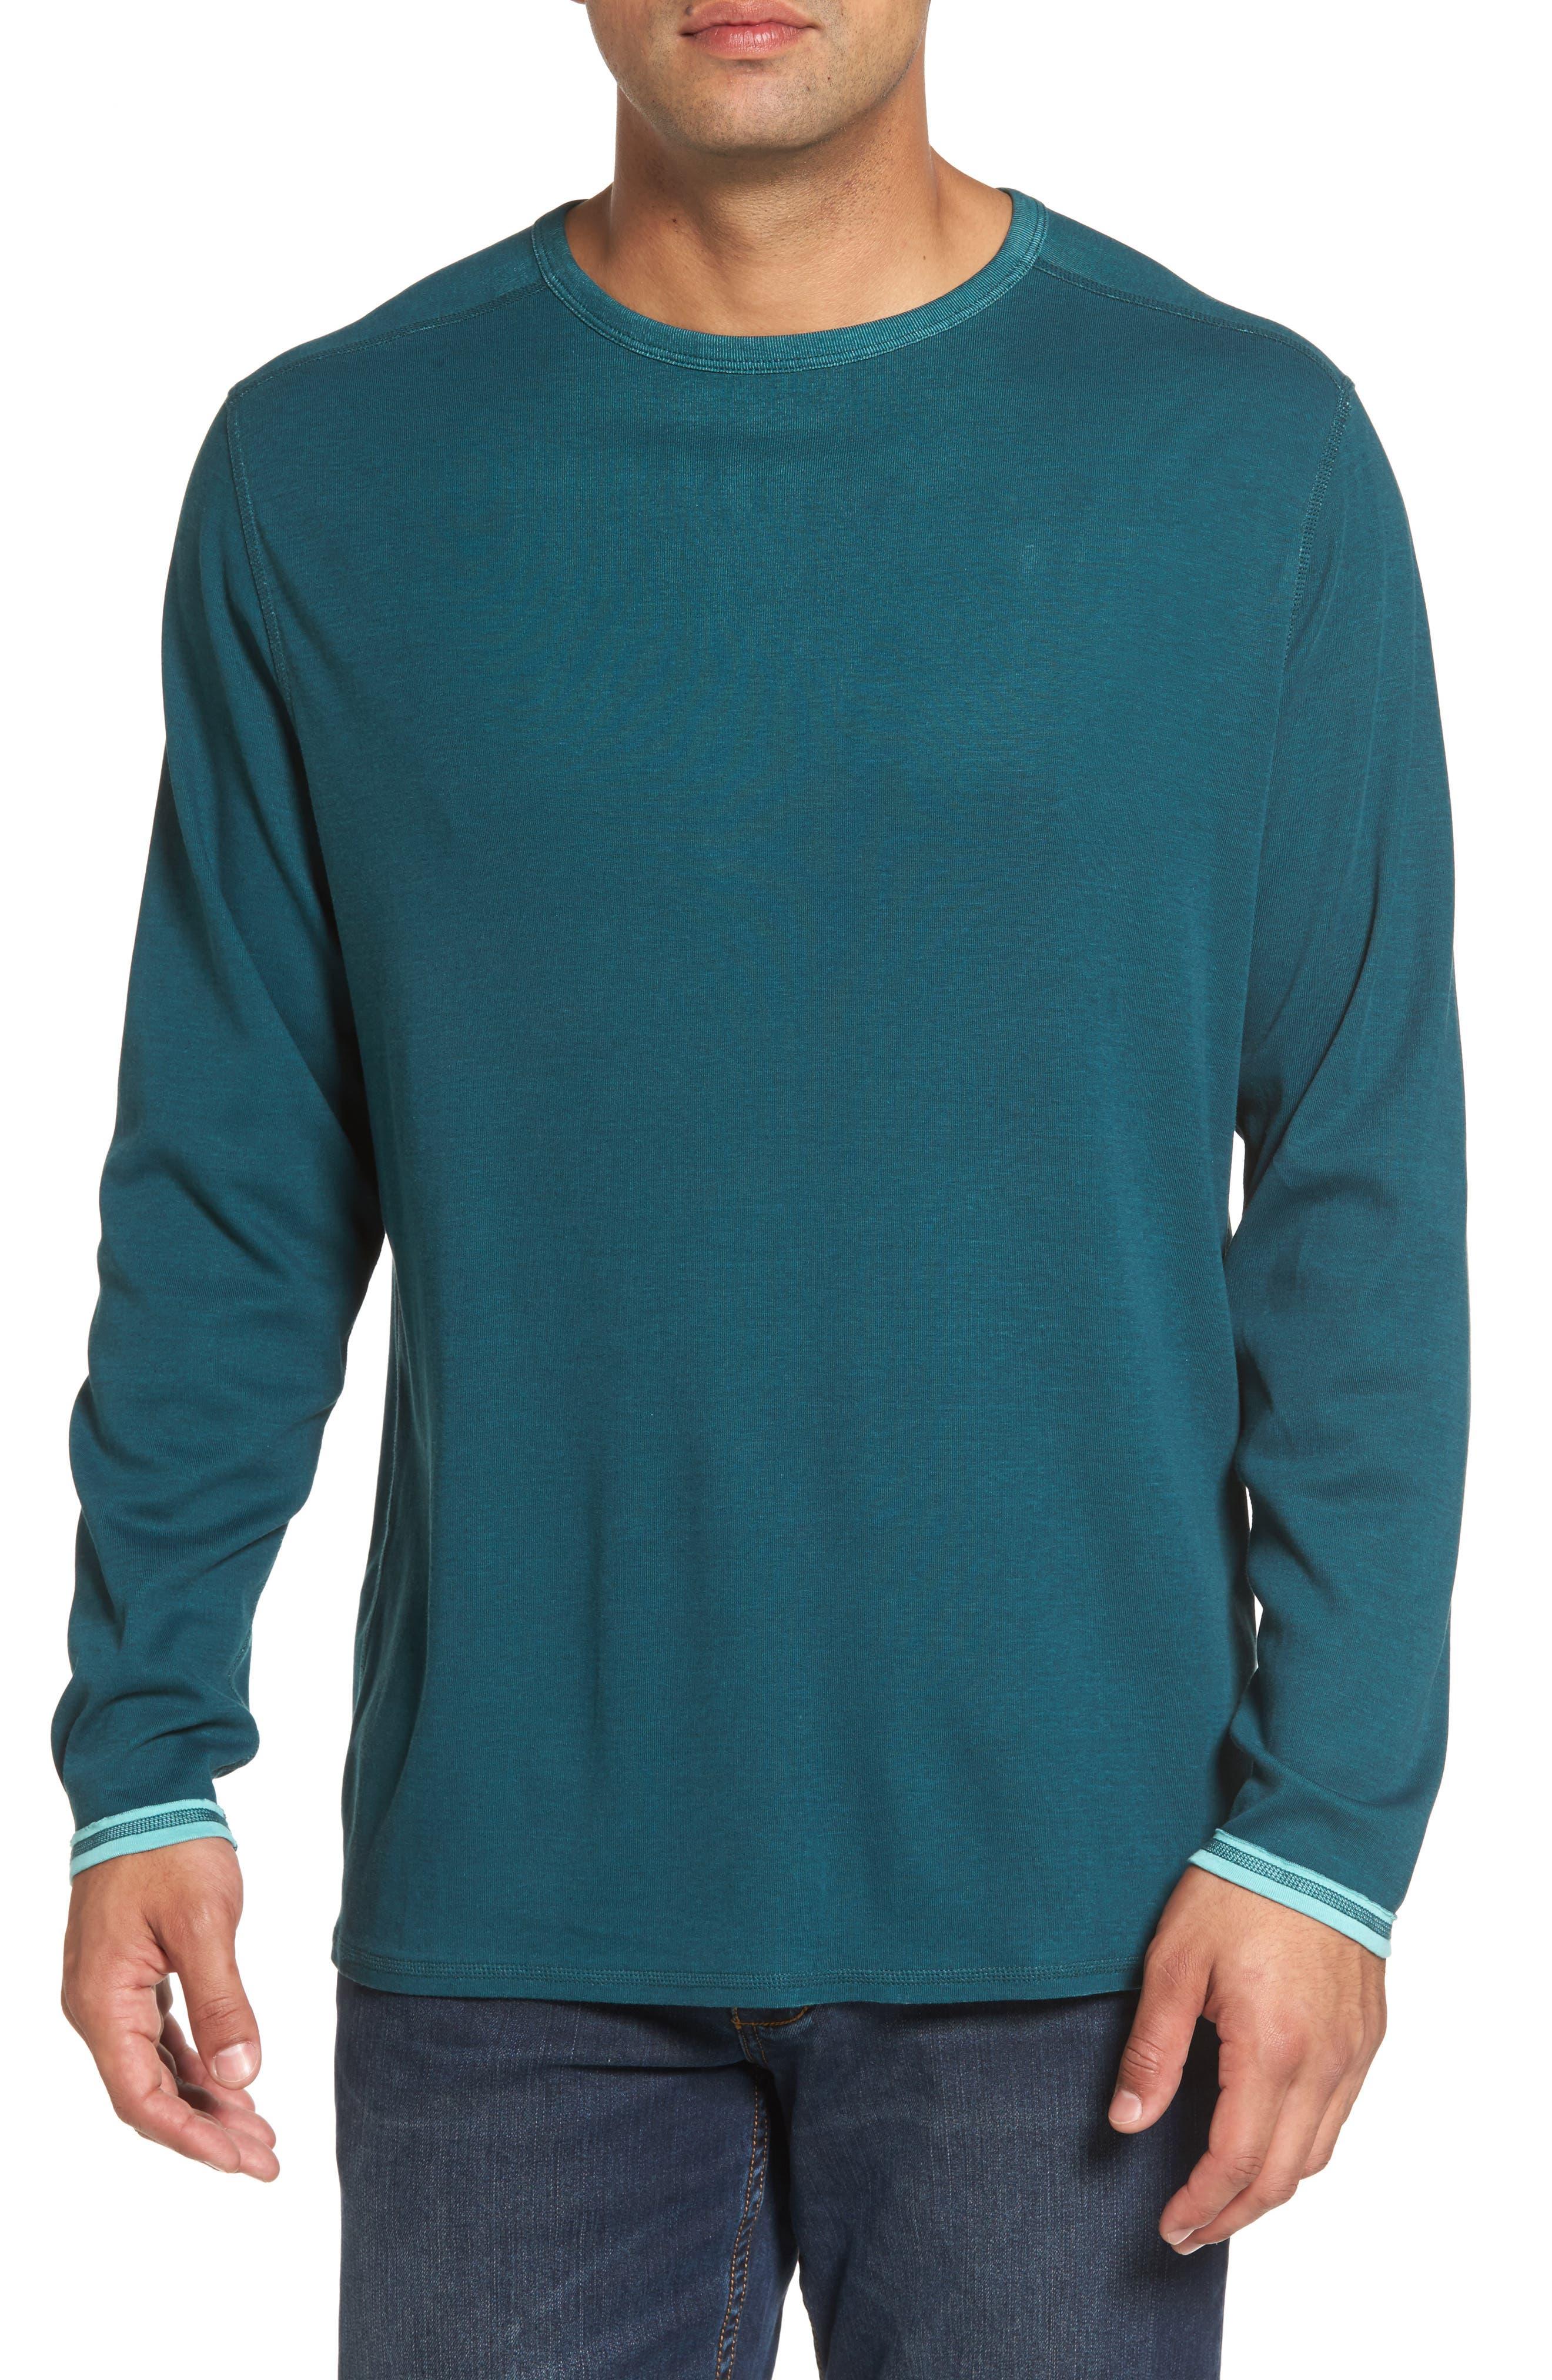 Dual in the Sun Reversible T-Shirt,                         Main,                         color, 300